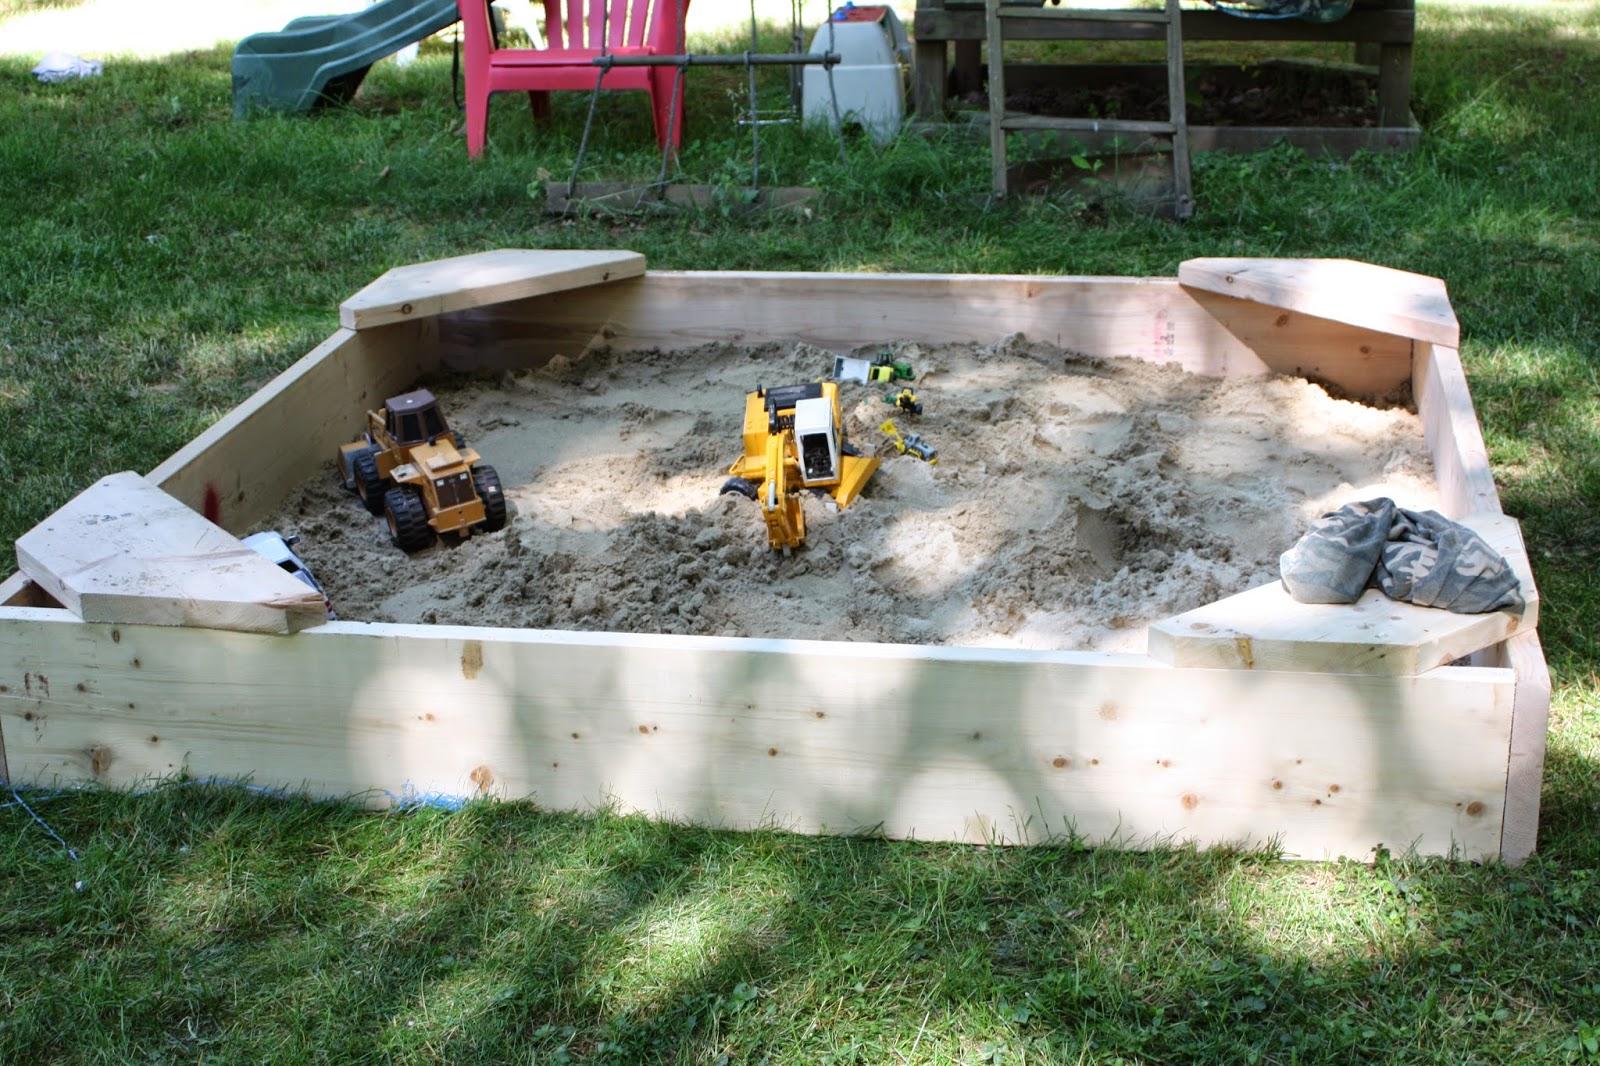 DIY Sandbox under $100